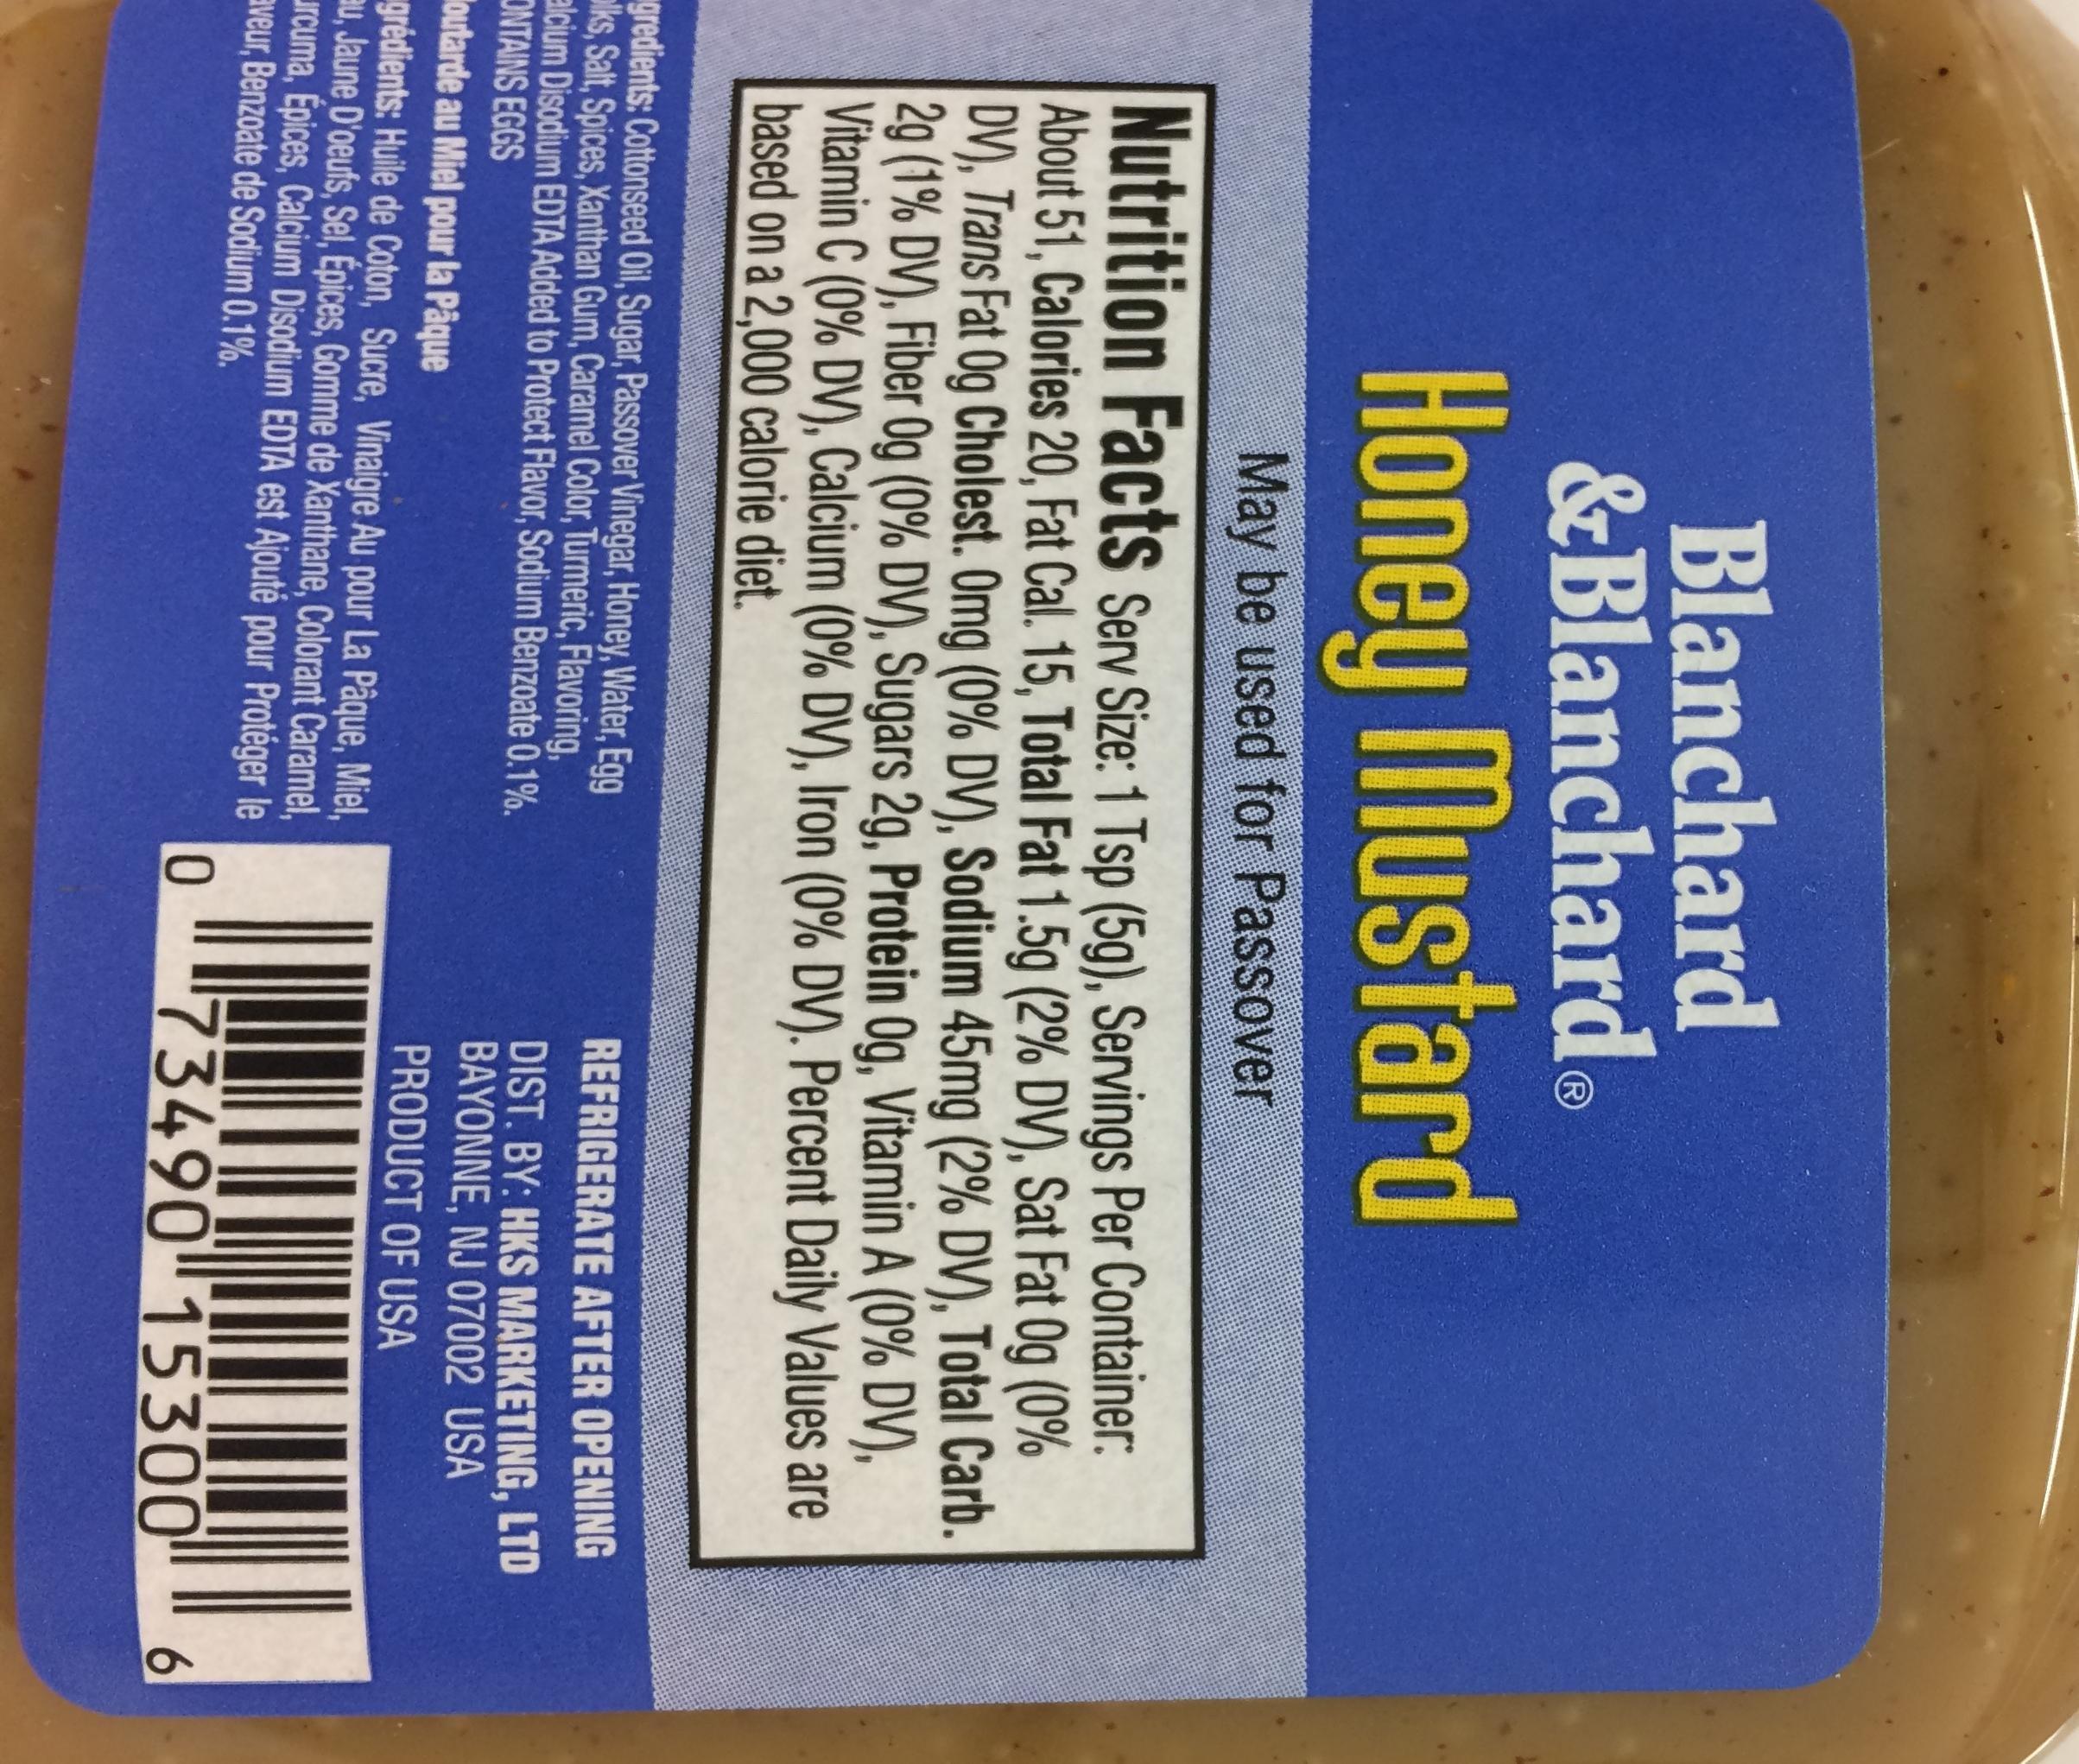 Blanchard & Blanchard Gluten Free Honey Mustard Kosher For Passover 9 oz. Pack of 3. by Blanchard & Blanchard